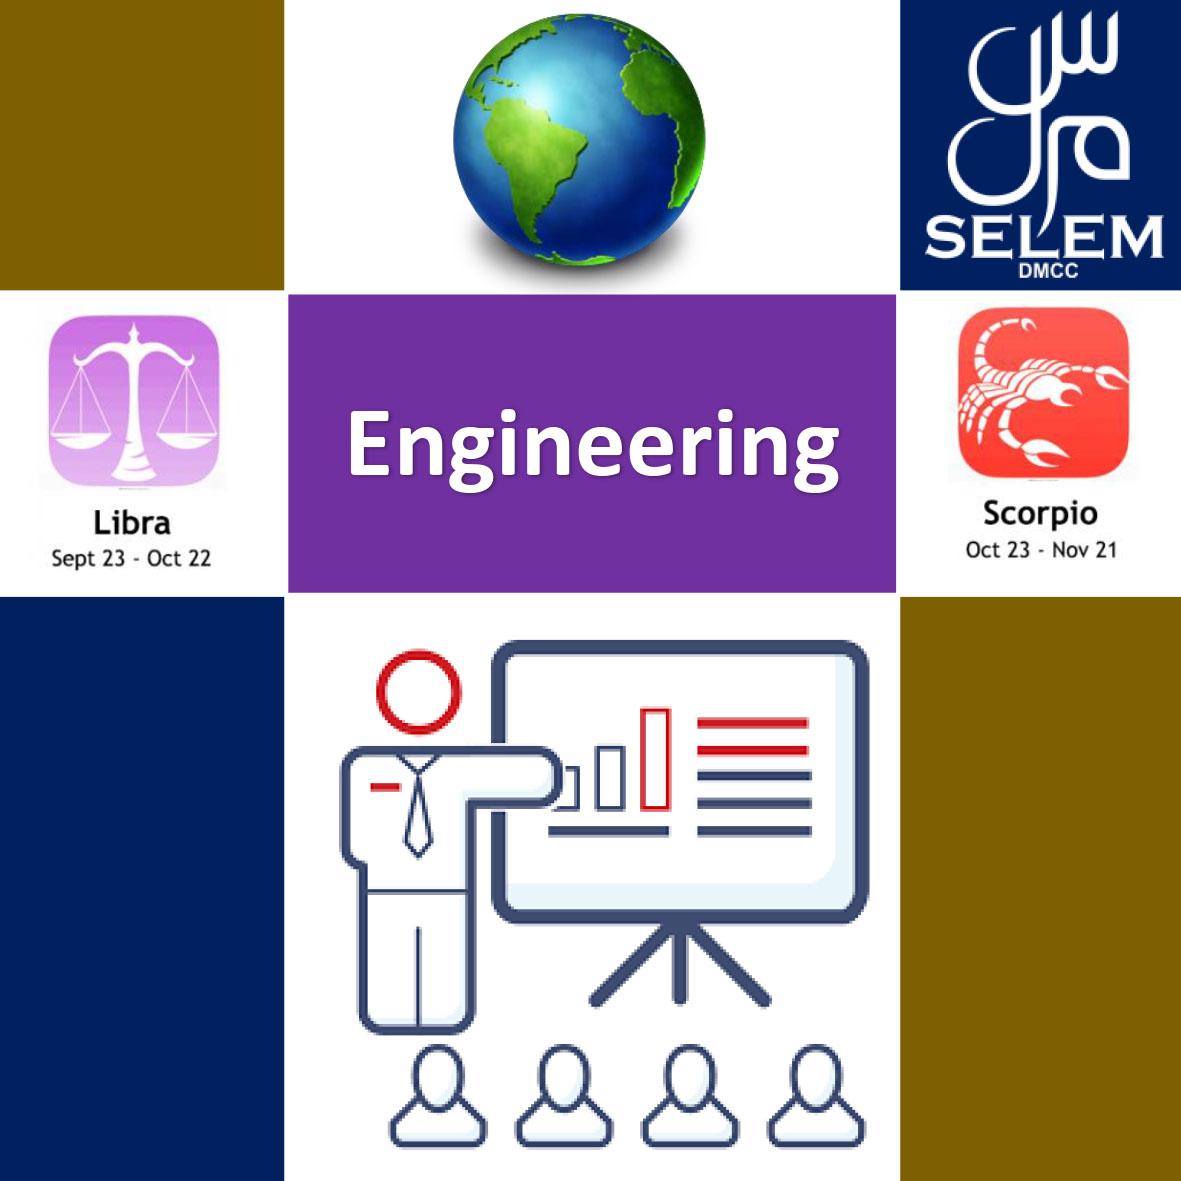 SELEM - Smart Engineering Leadership Excellence Management